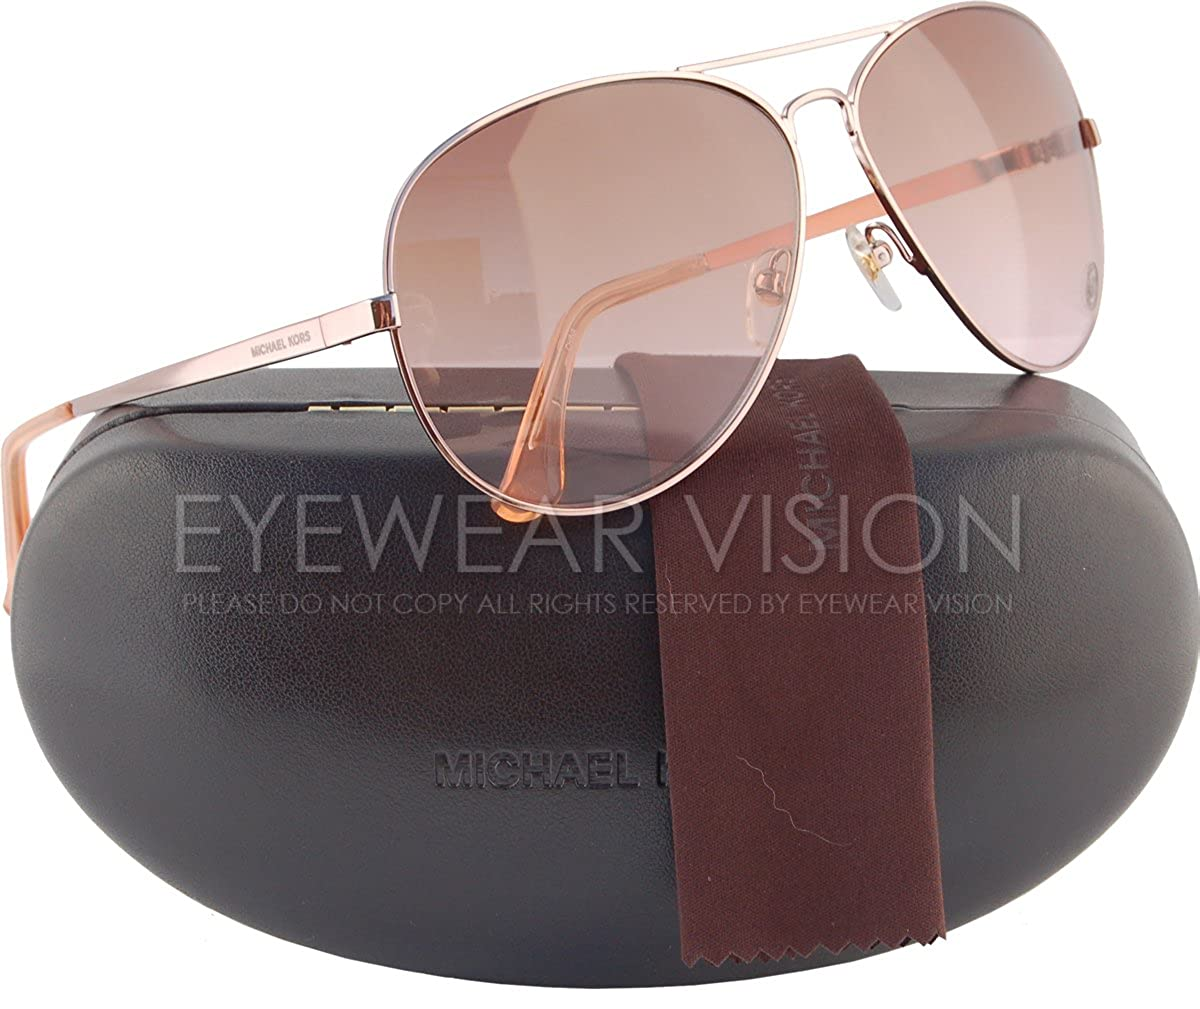 c5da4f05abbce Michael Kors M2058S Lola Aviator Sunglasses Rose Gold w Brown Gradient  (780) MK 2058 720 63mm  Amazon.ca  Clothing   Accessories